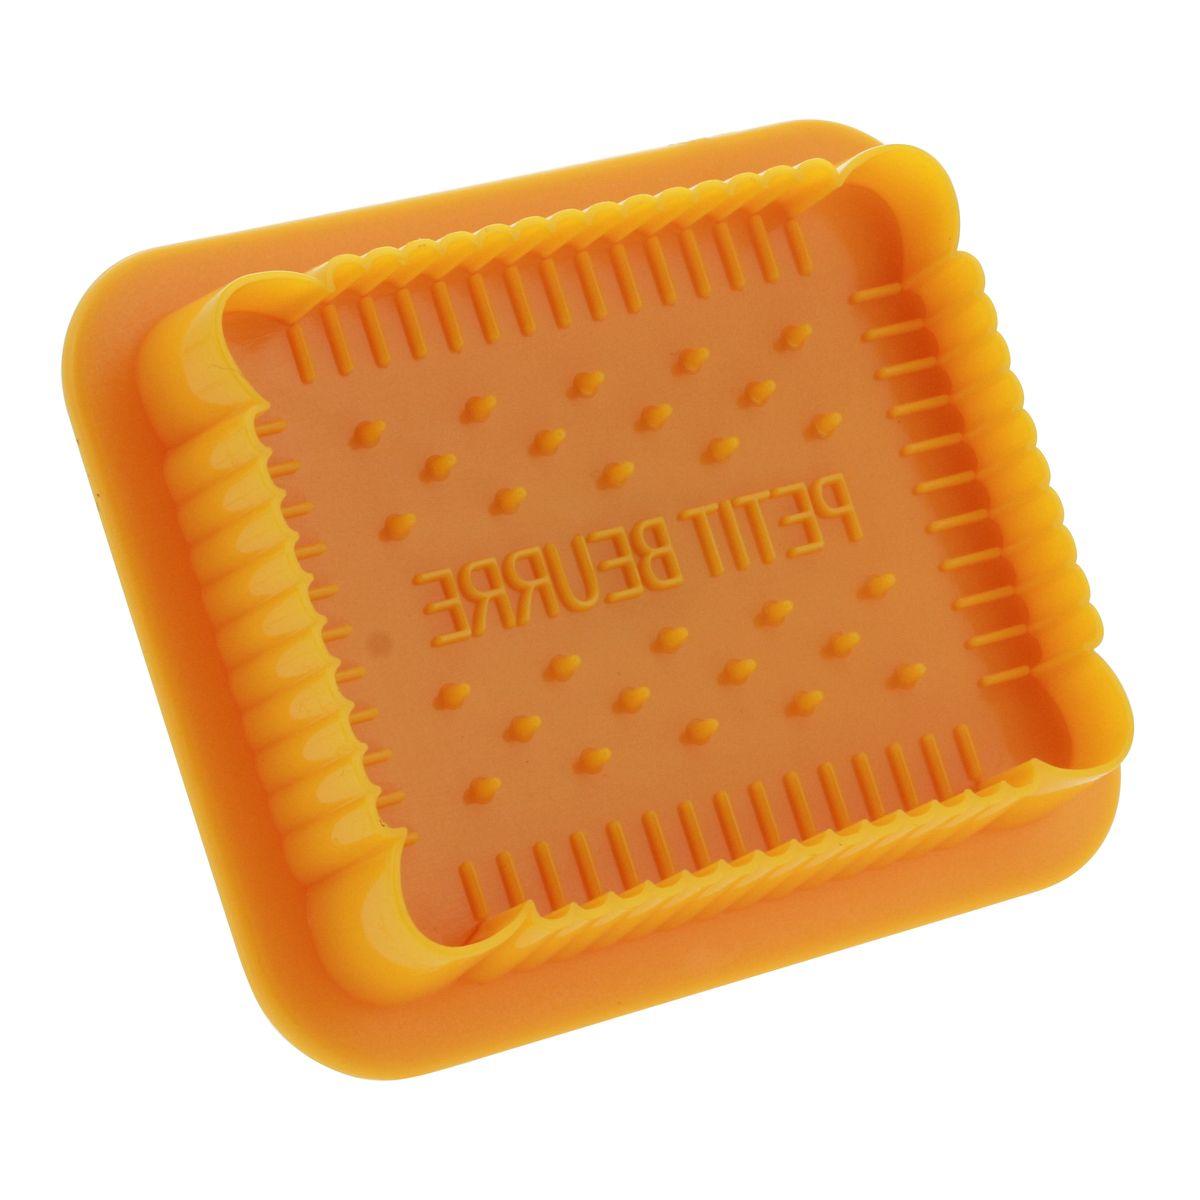 Emporte-pièce biscuit Petit Beurre - Ibili